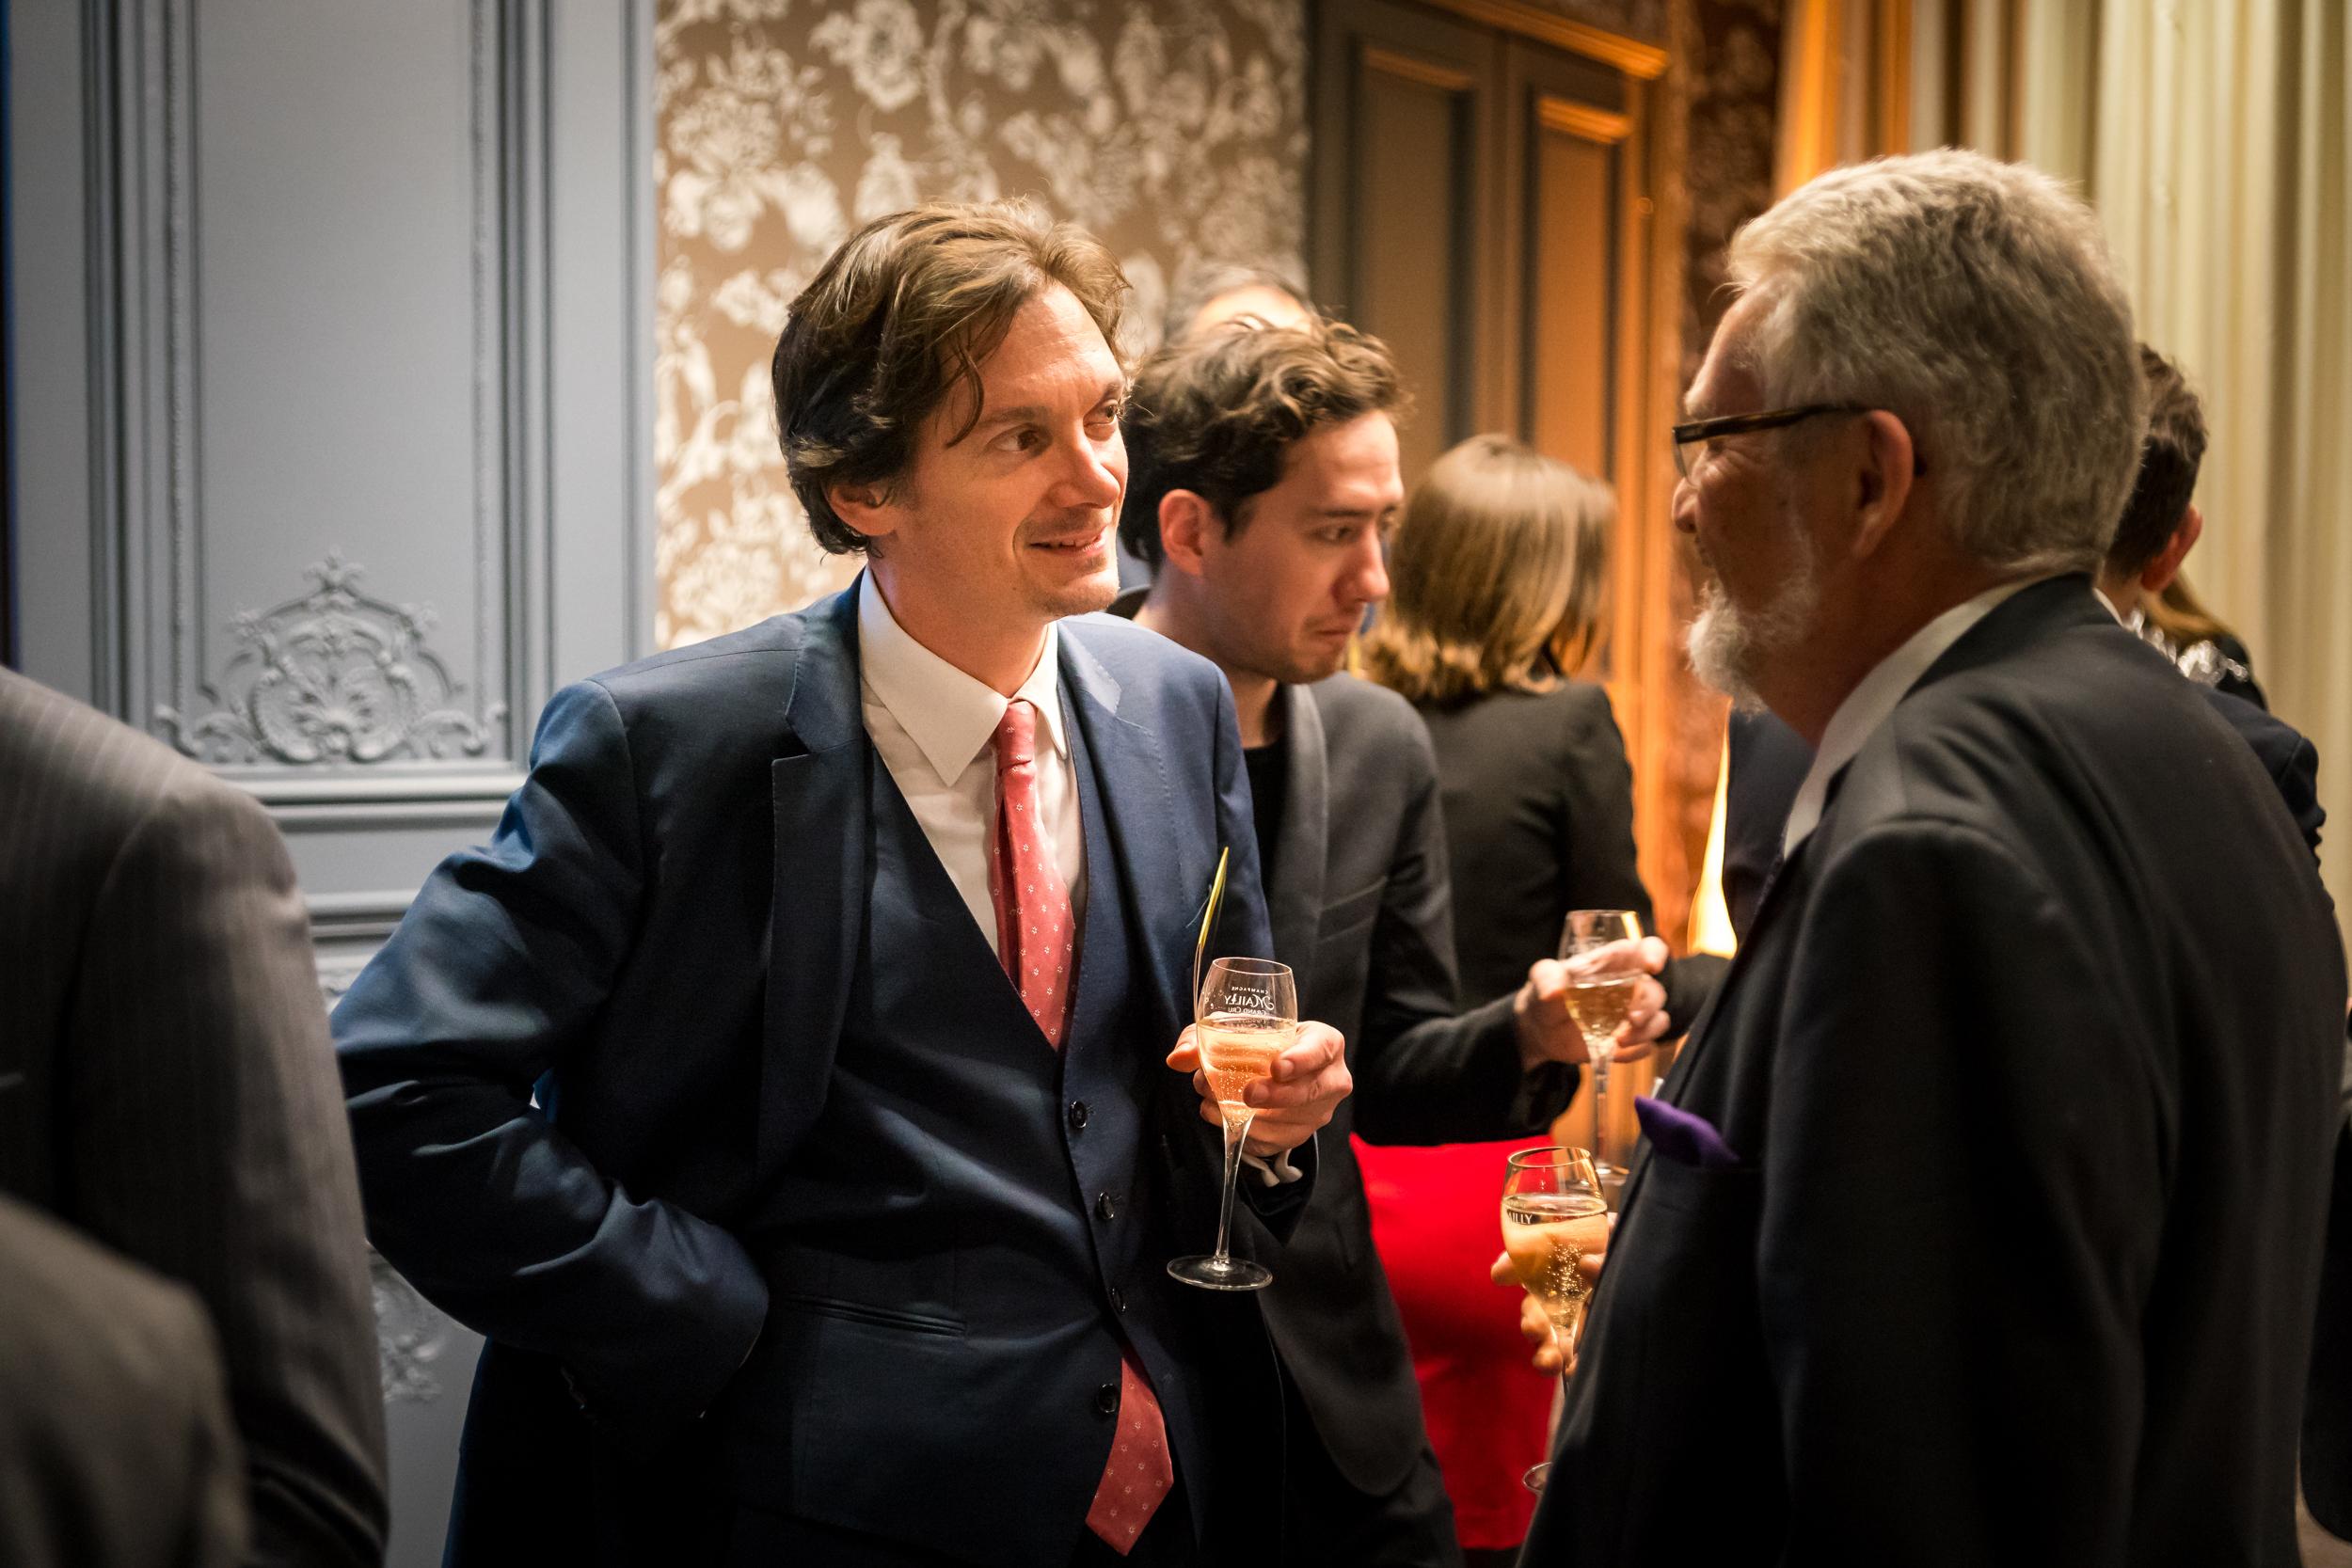 Le Club des Juristes_Diner de Noël _14-12-18 _ Florian Leger_SHARE & DARE_ HD_ N°-61.jpg